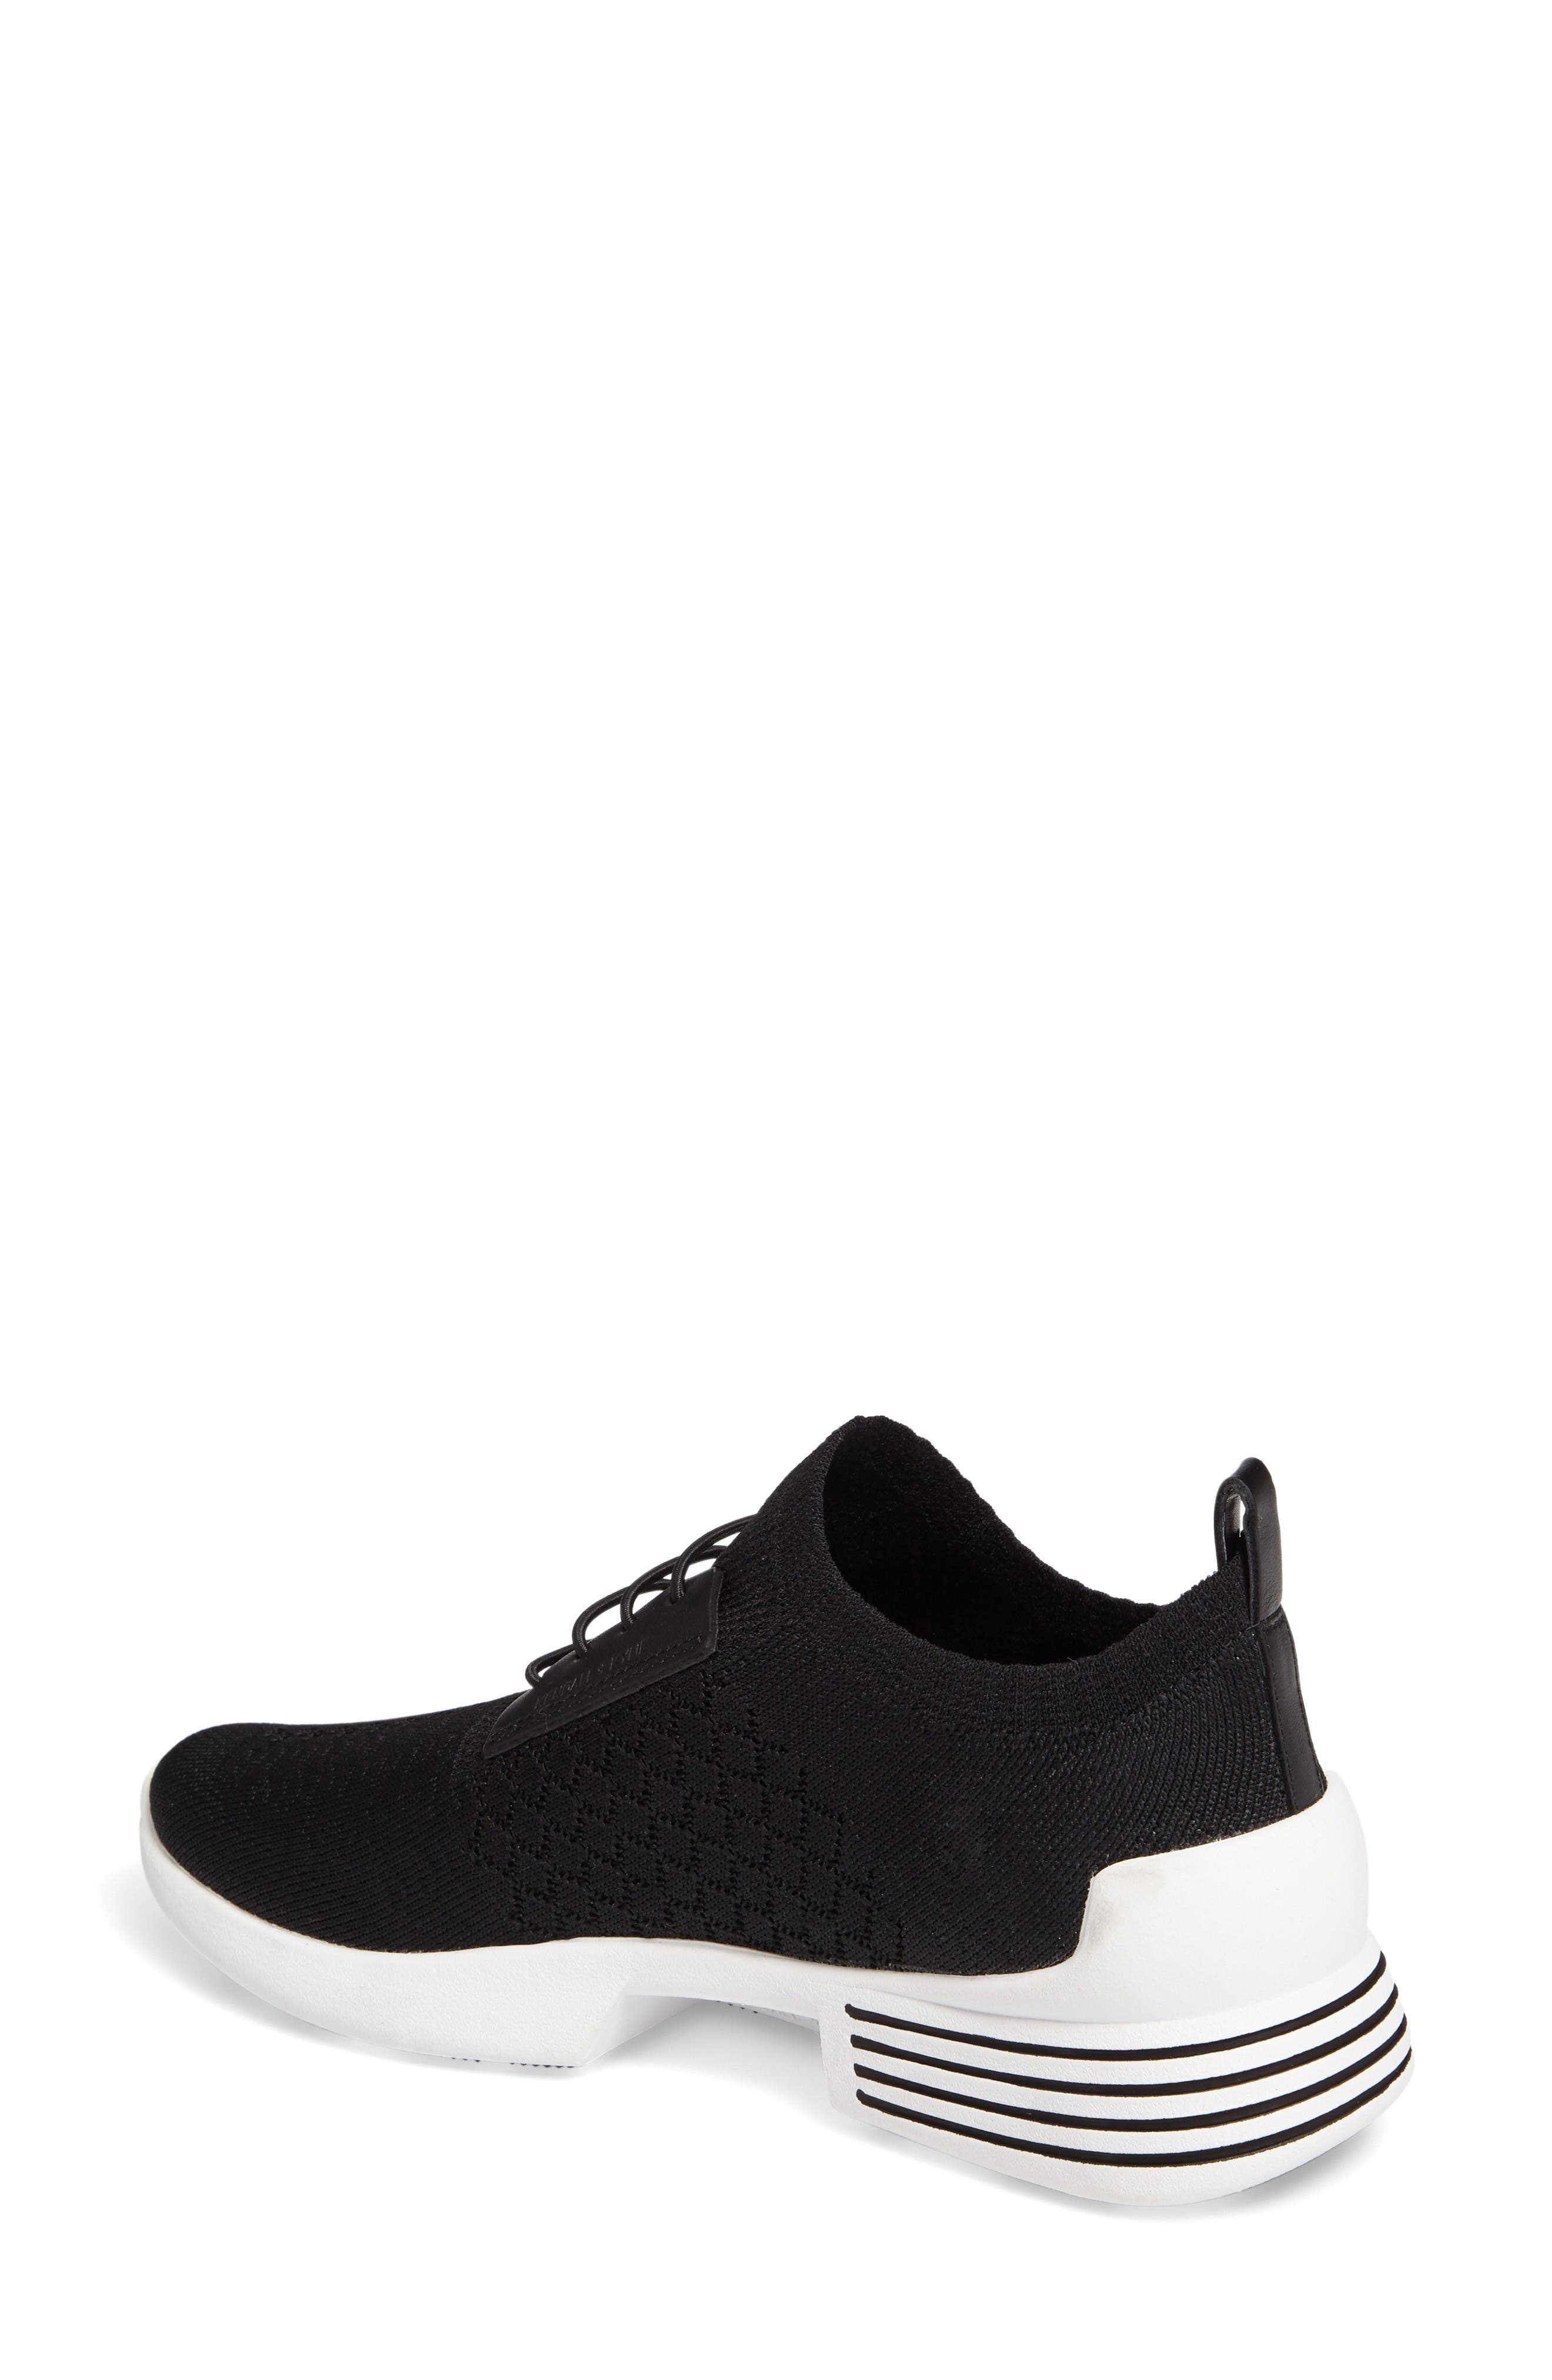 Alternate Image 2  - KENDALL + KYLIE Brandy Woven Sneaker (Women)